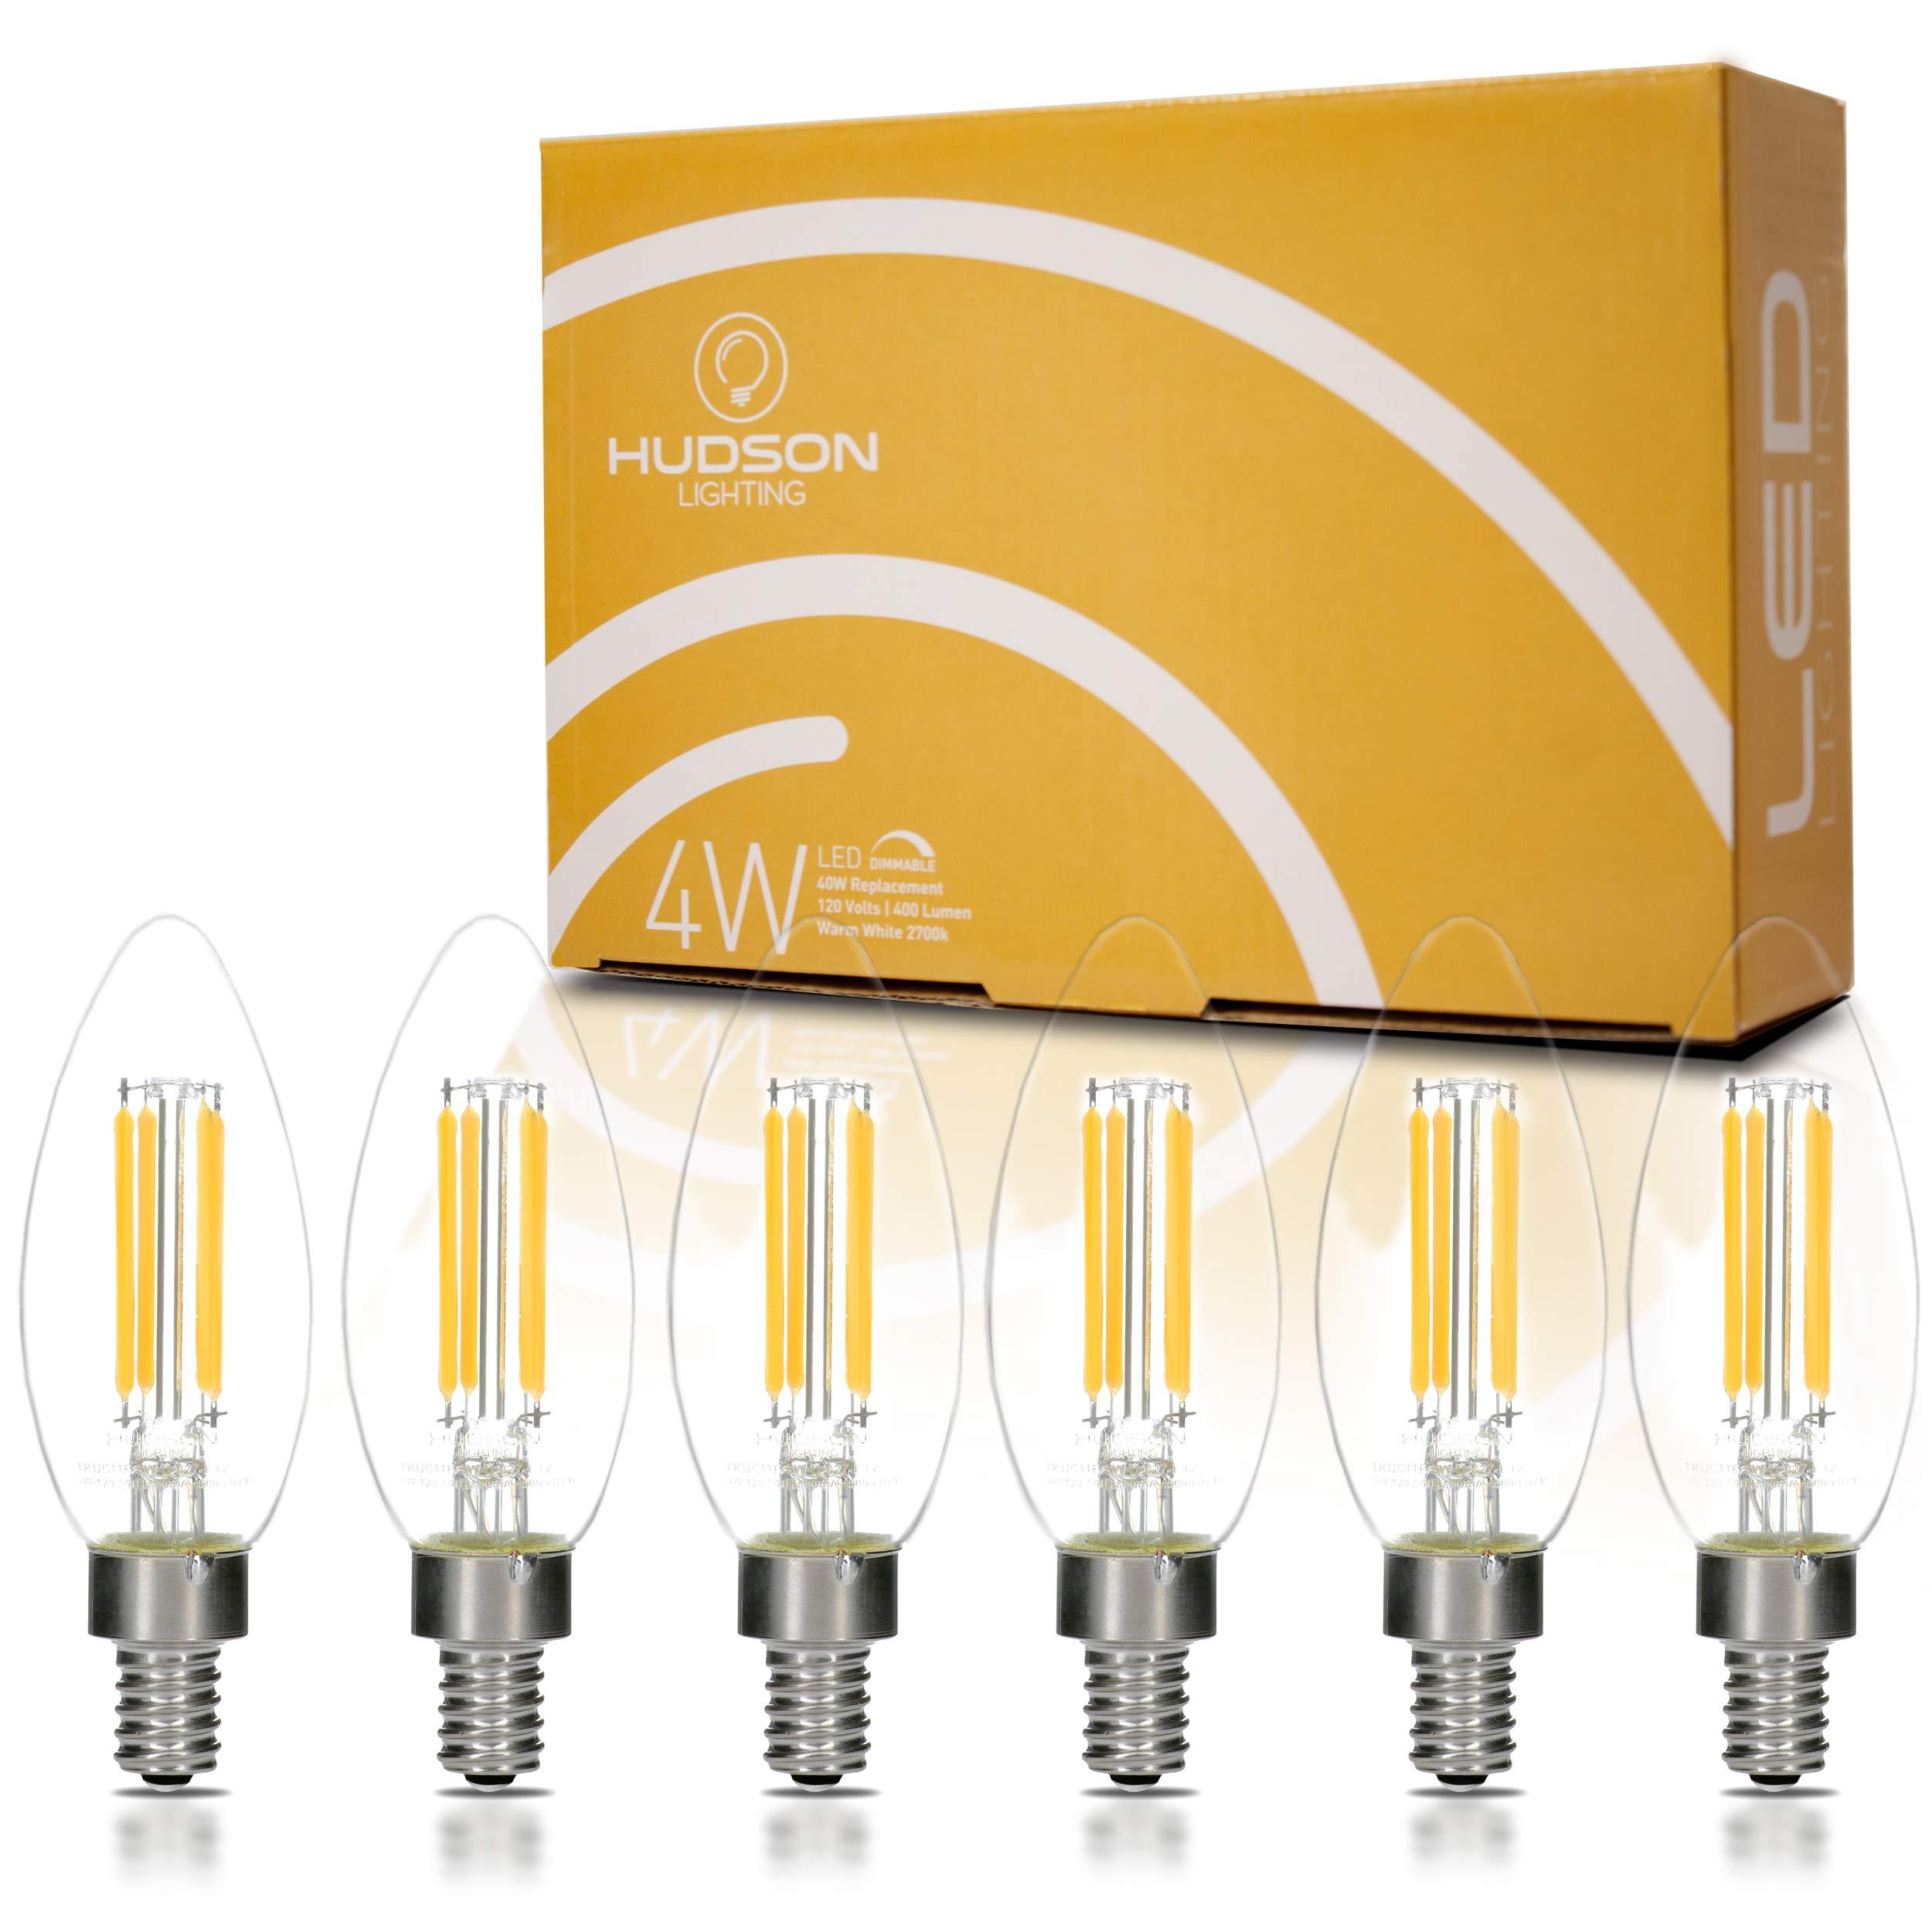 Dimmable LED Candelabra Light Bulbs: 4 Watt, 2700K Teardrop Lightbulbs for Indoor Lamp, Chandelier, Ceiling Fan or Outdoor Porch Lights - 400 Lumen Warm White Retro Filament Lightbulb Set - 6 Pack